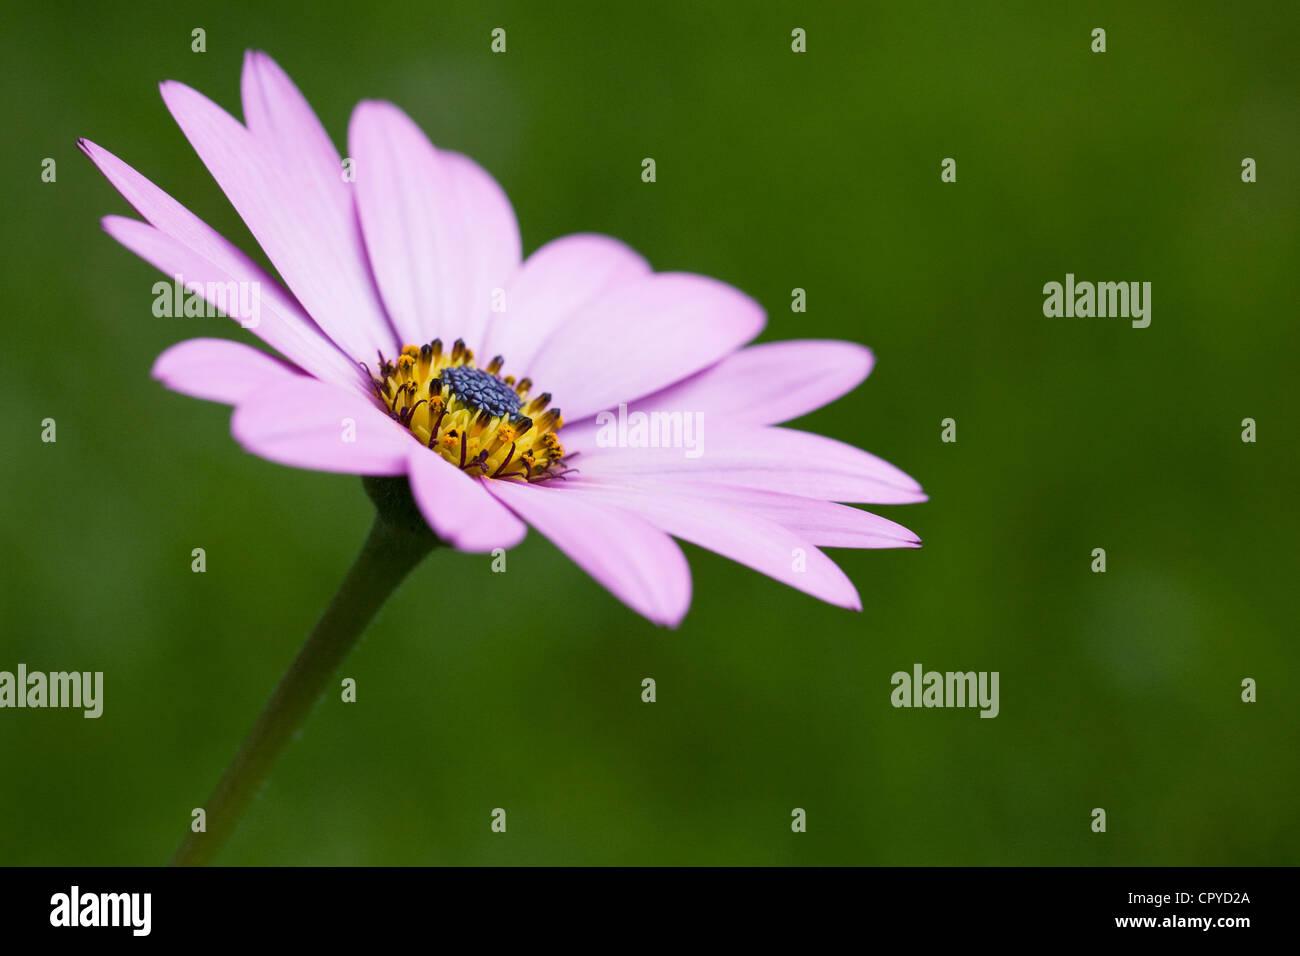 Ostéospermum ciliata Killerton 'Pink' fleurs dans le jardin. Cape daisy. Daisy africains. Photo Stock